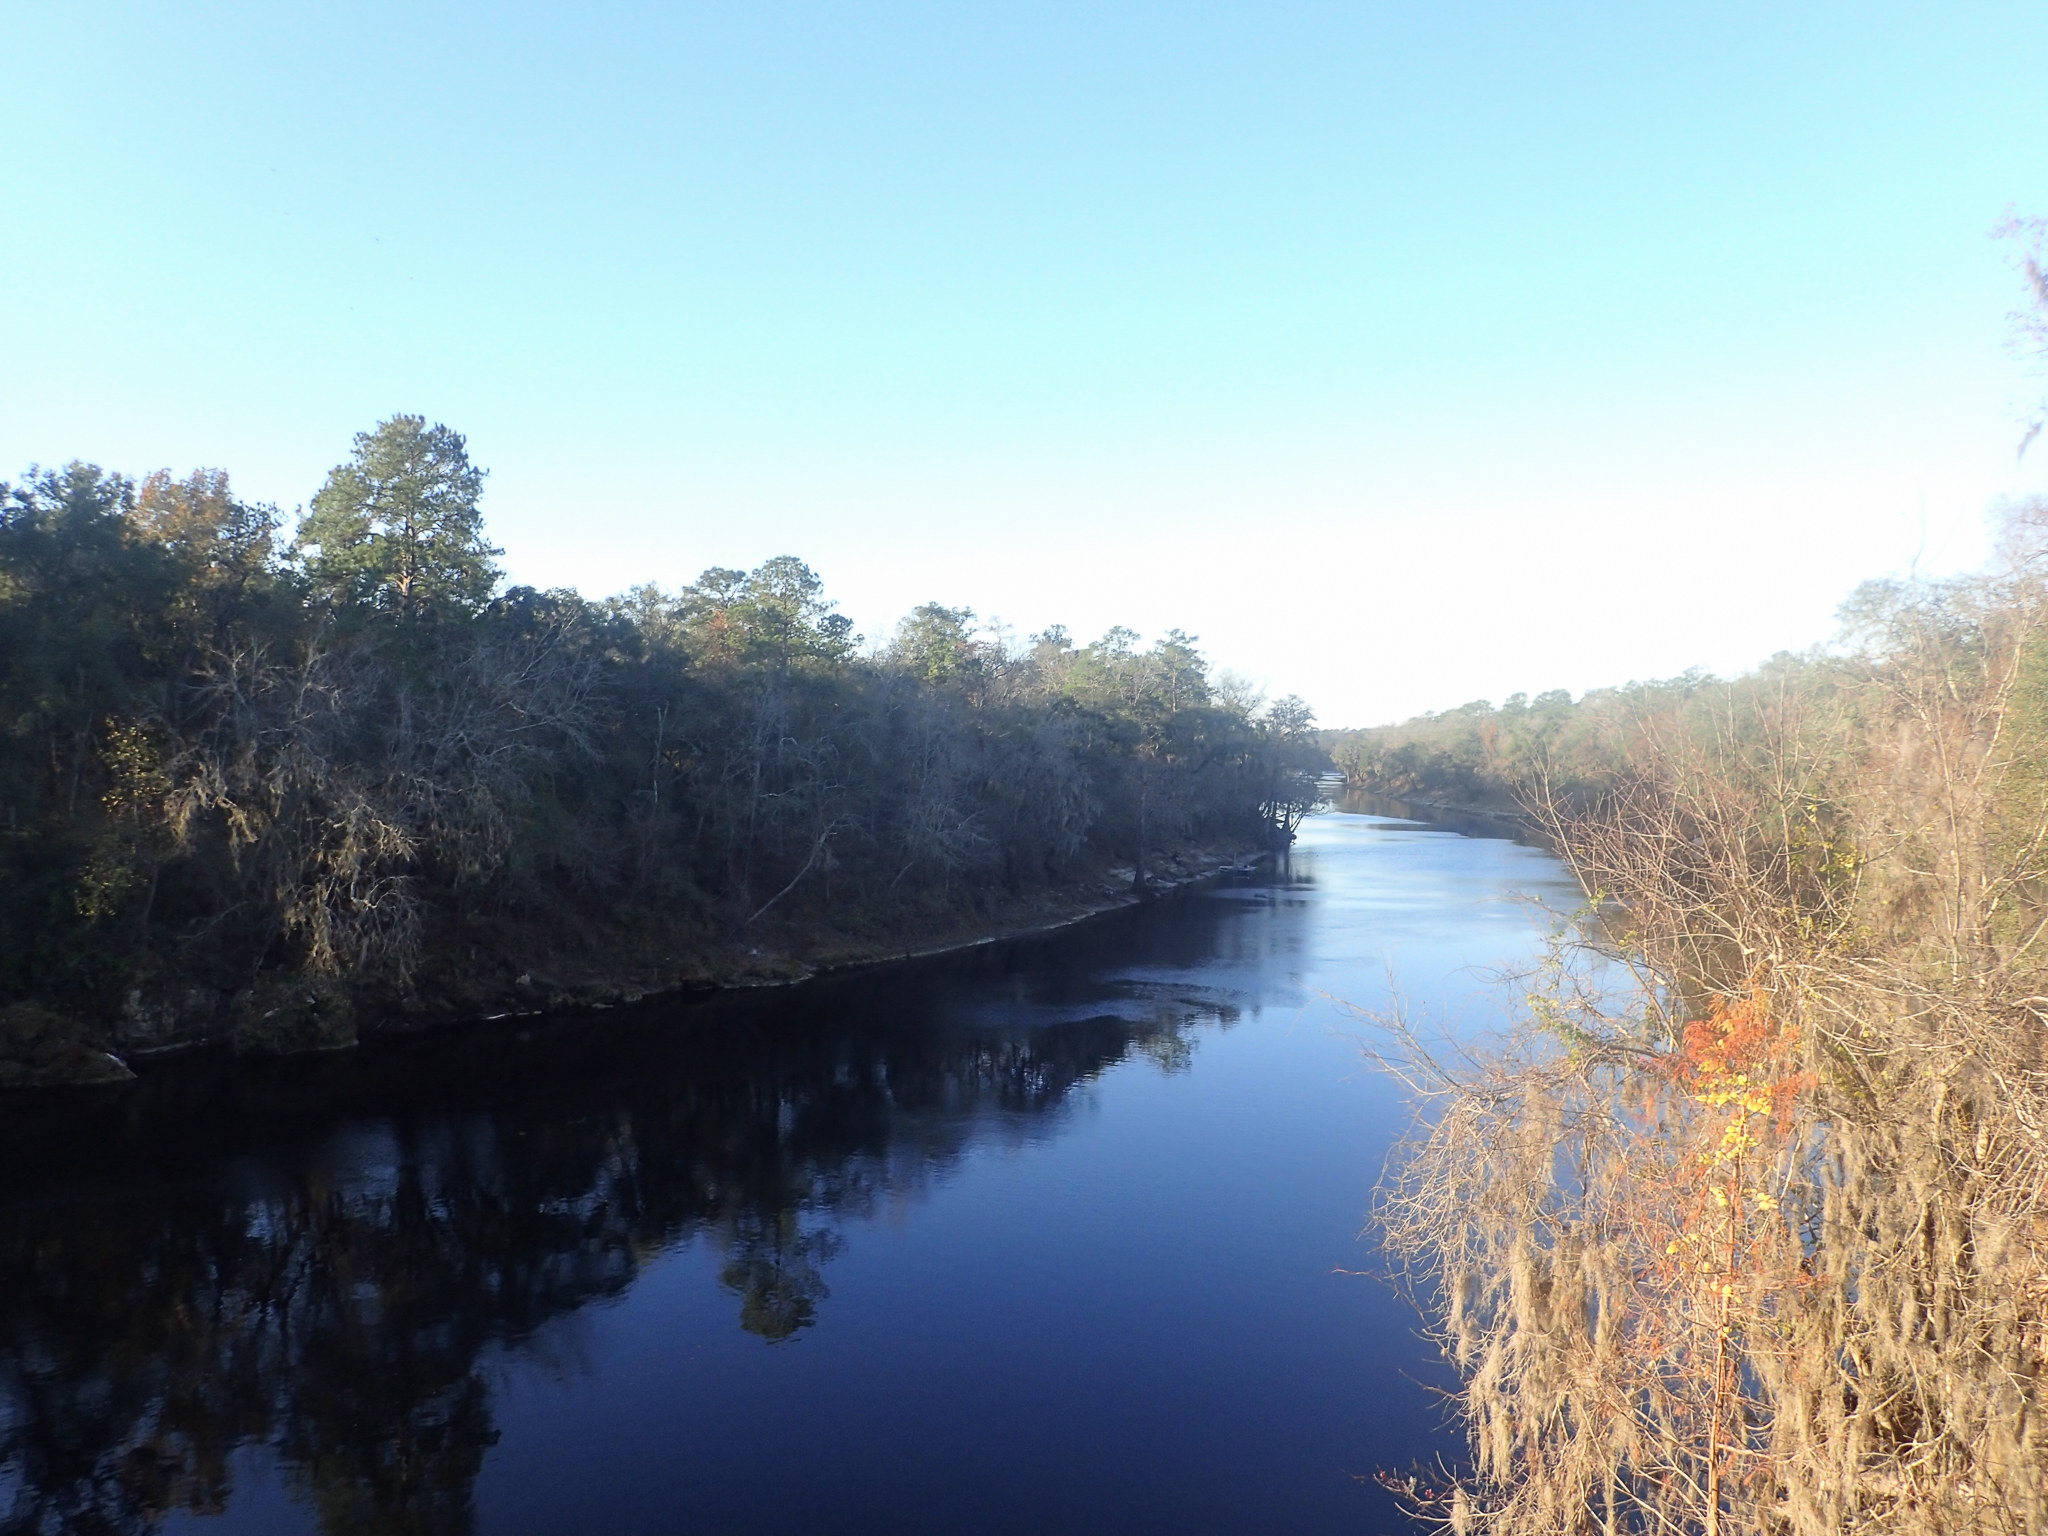 The Suwannee River, Florida